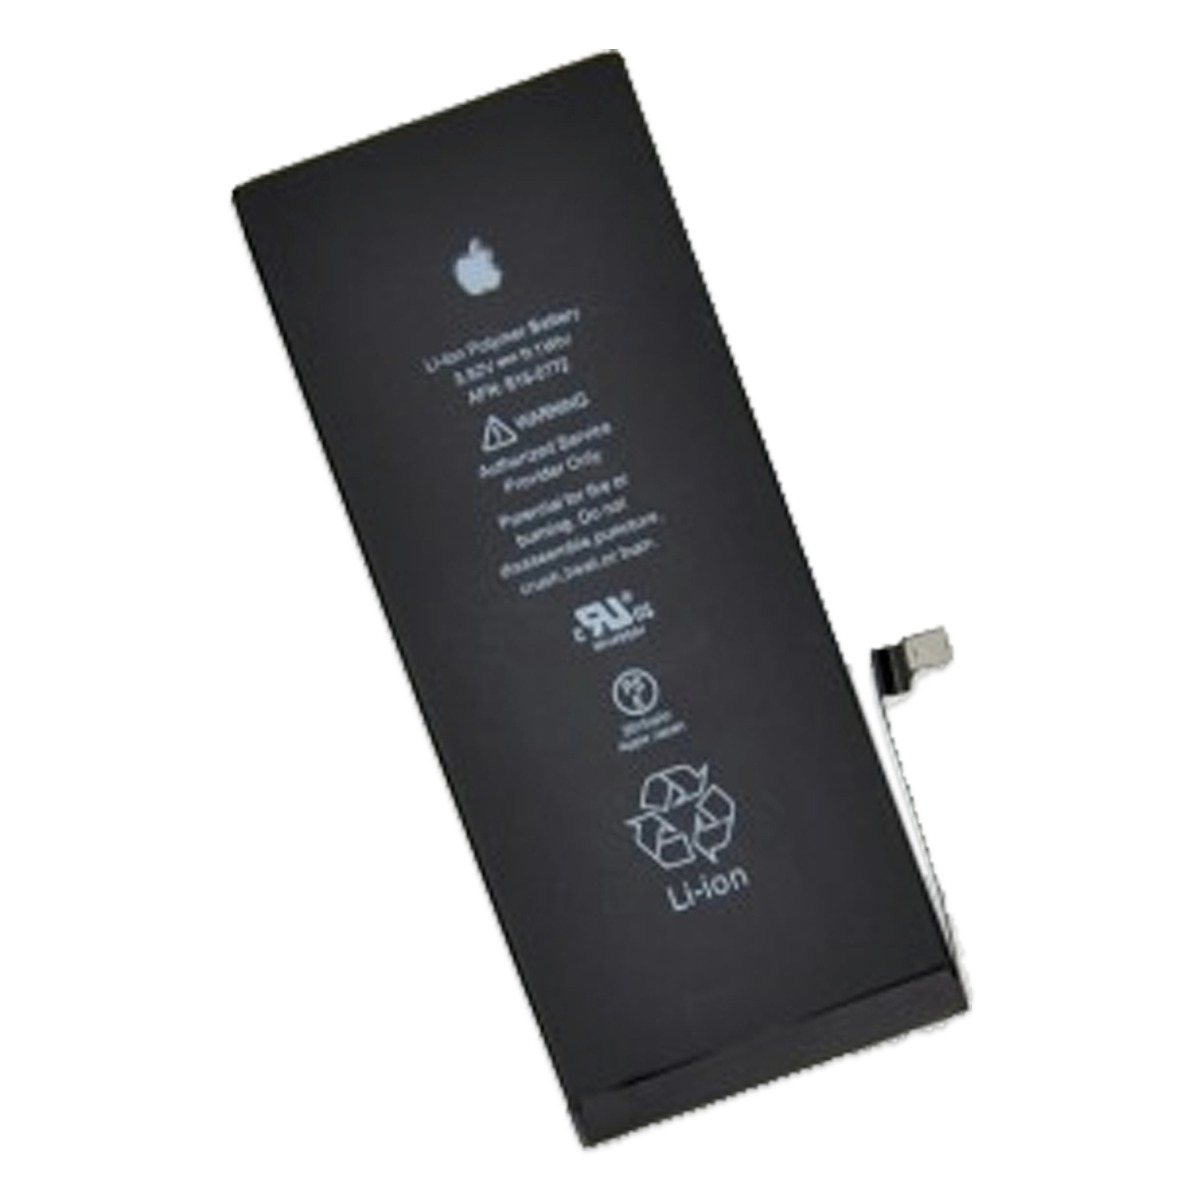 9a1110601d1 bateria iphone 6 plus 5.5 2915mah 6plus a1524 original. Carregando zoom.